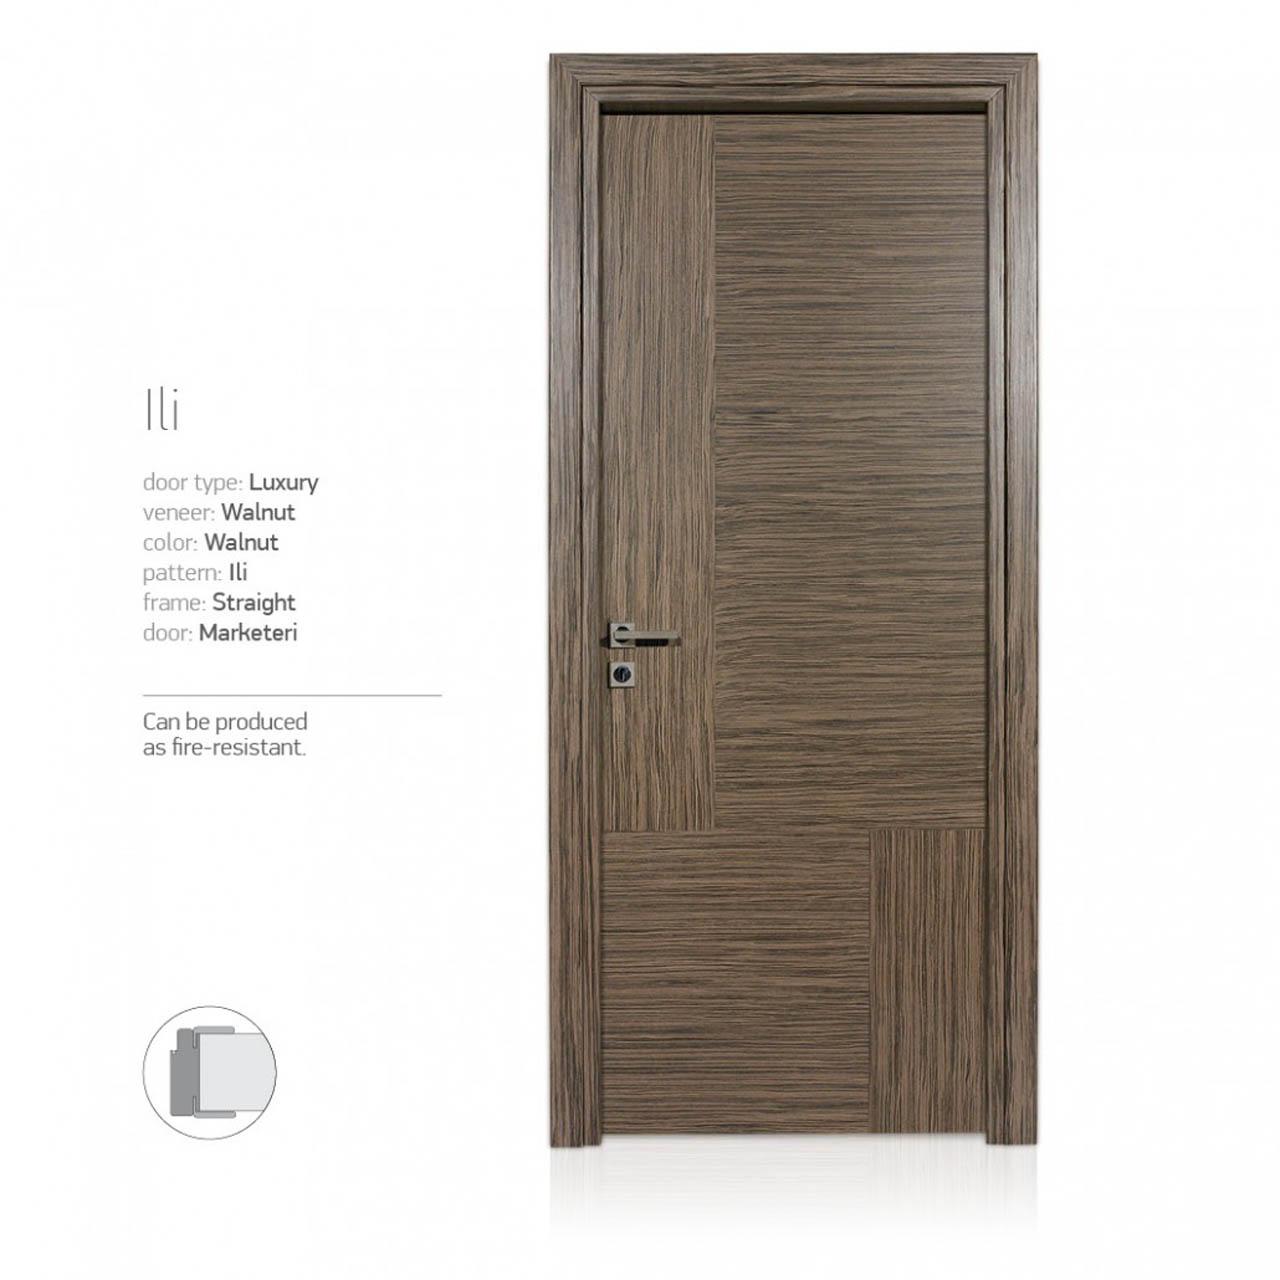 portes-site-luxury-eng15-1030x1030